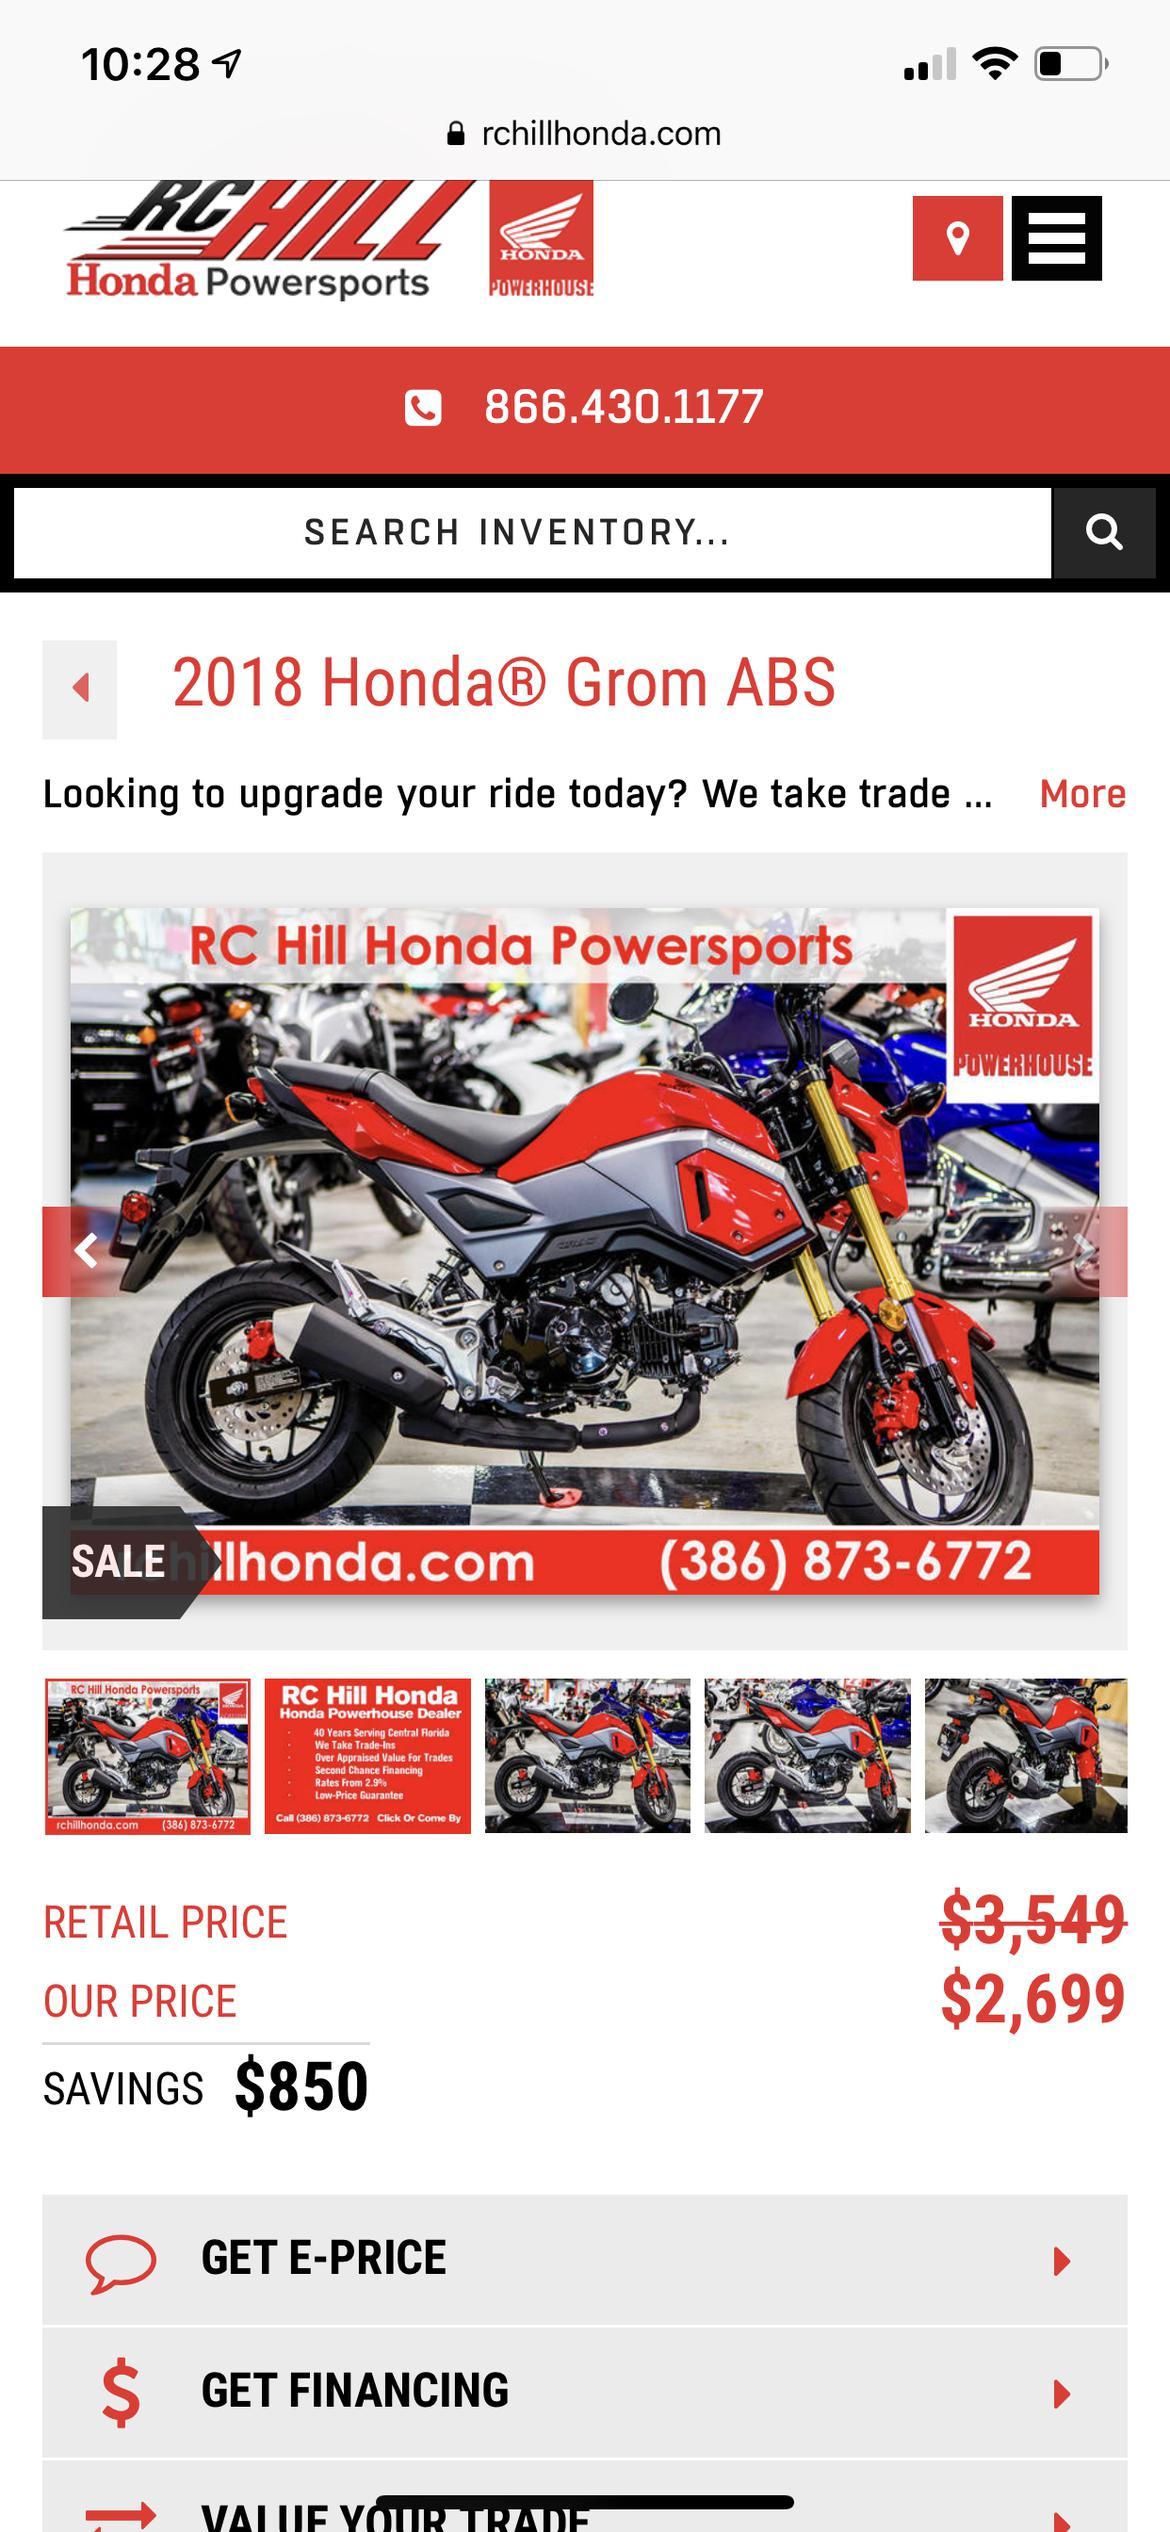 Used Honda Grom For Sale Craigslist : honda, craigslist, Should, Honda, Kawasaki, Z125?-Page, Motorcycles, Bicycles, Forum